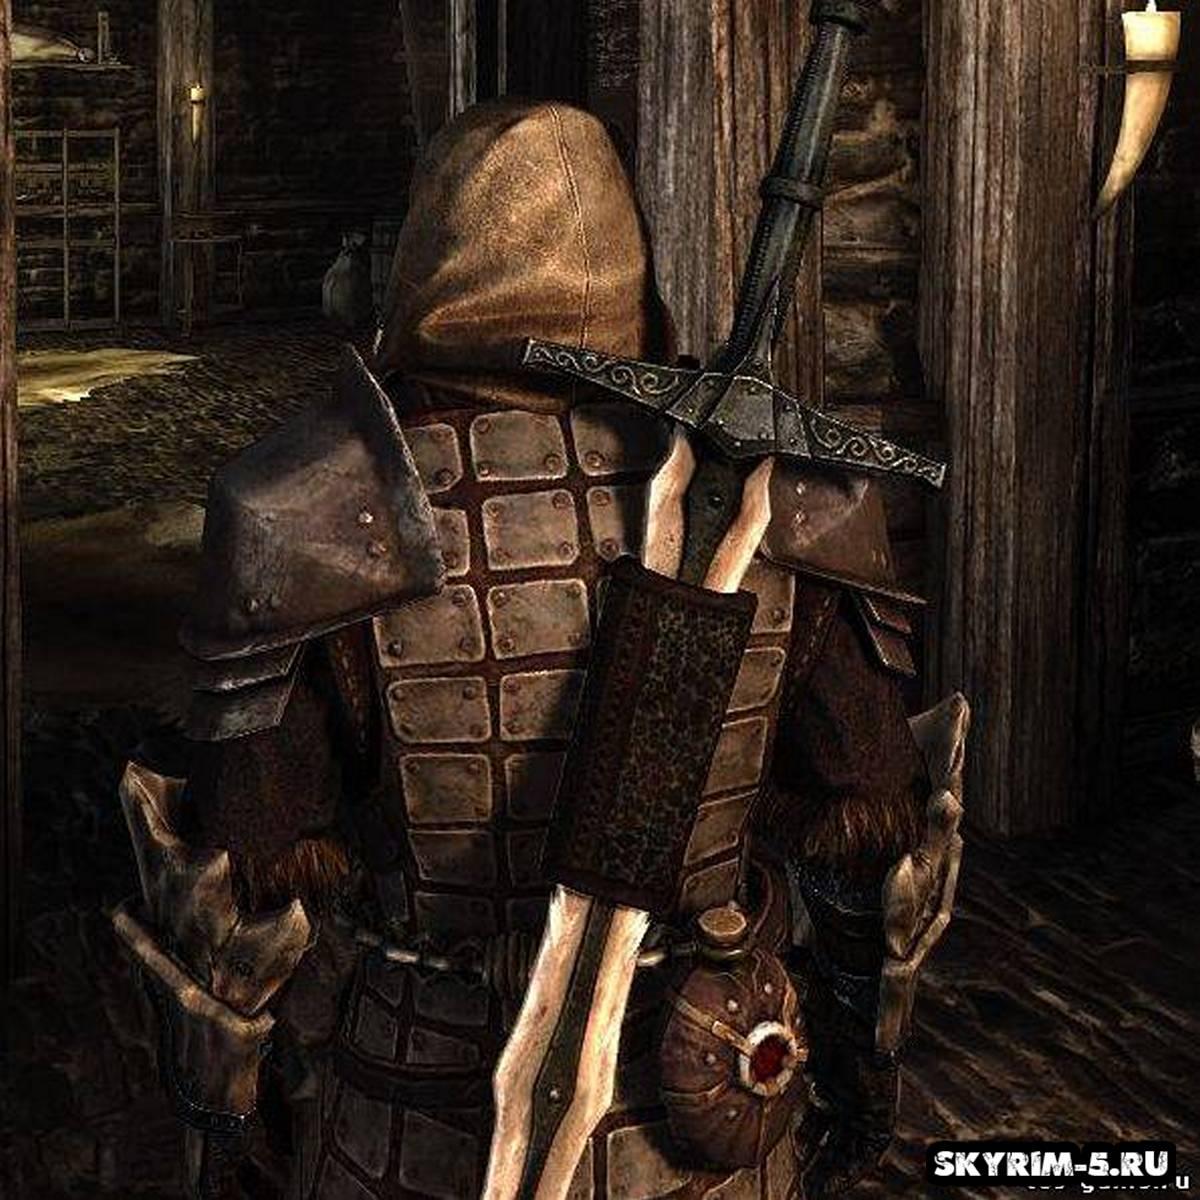 Ножны для всех двуручных мечей